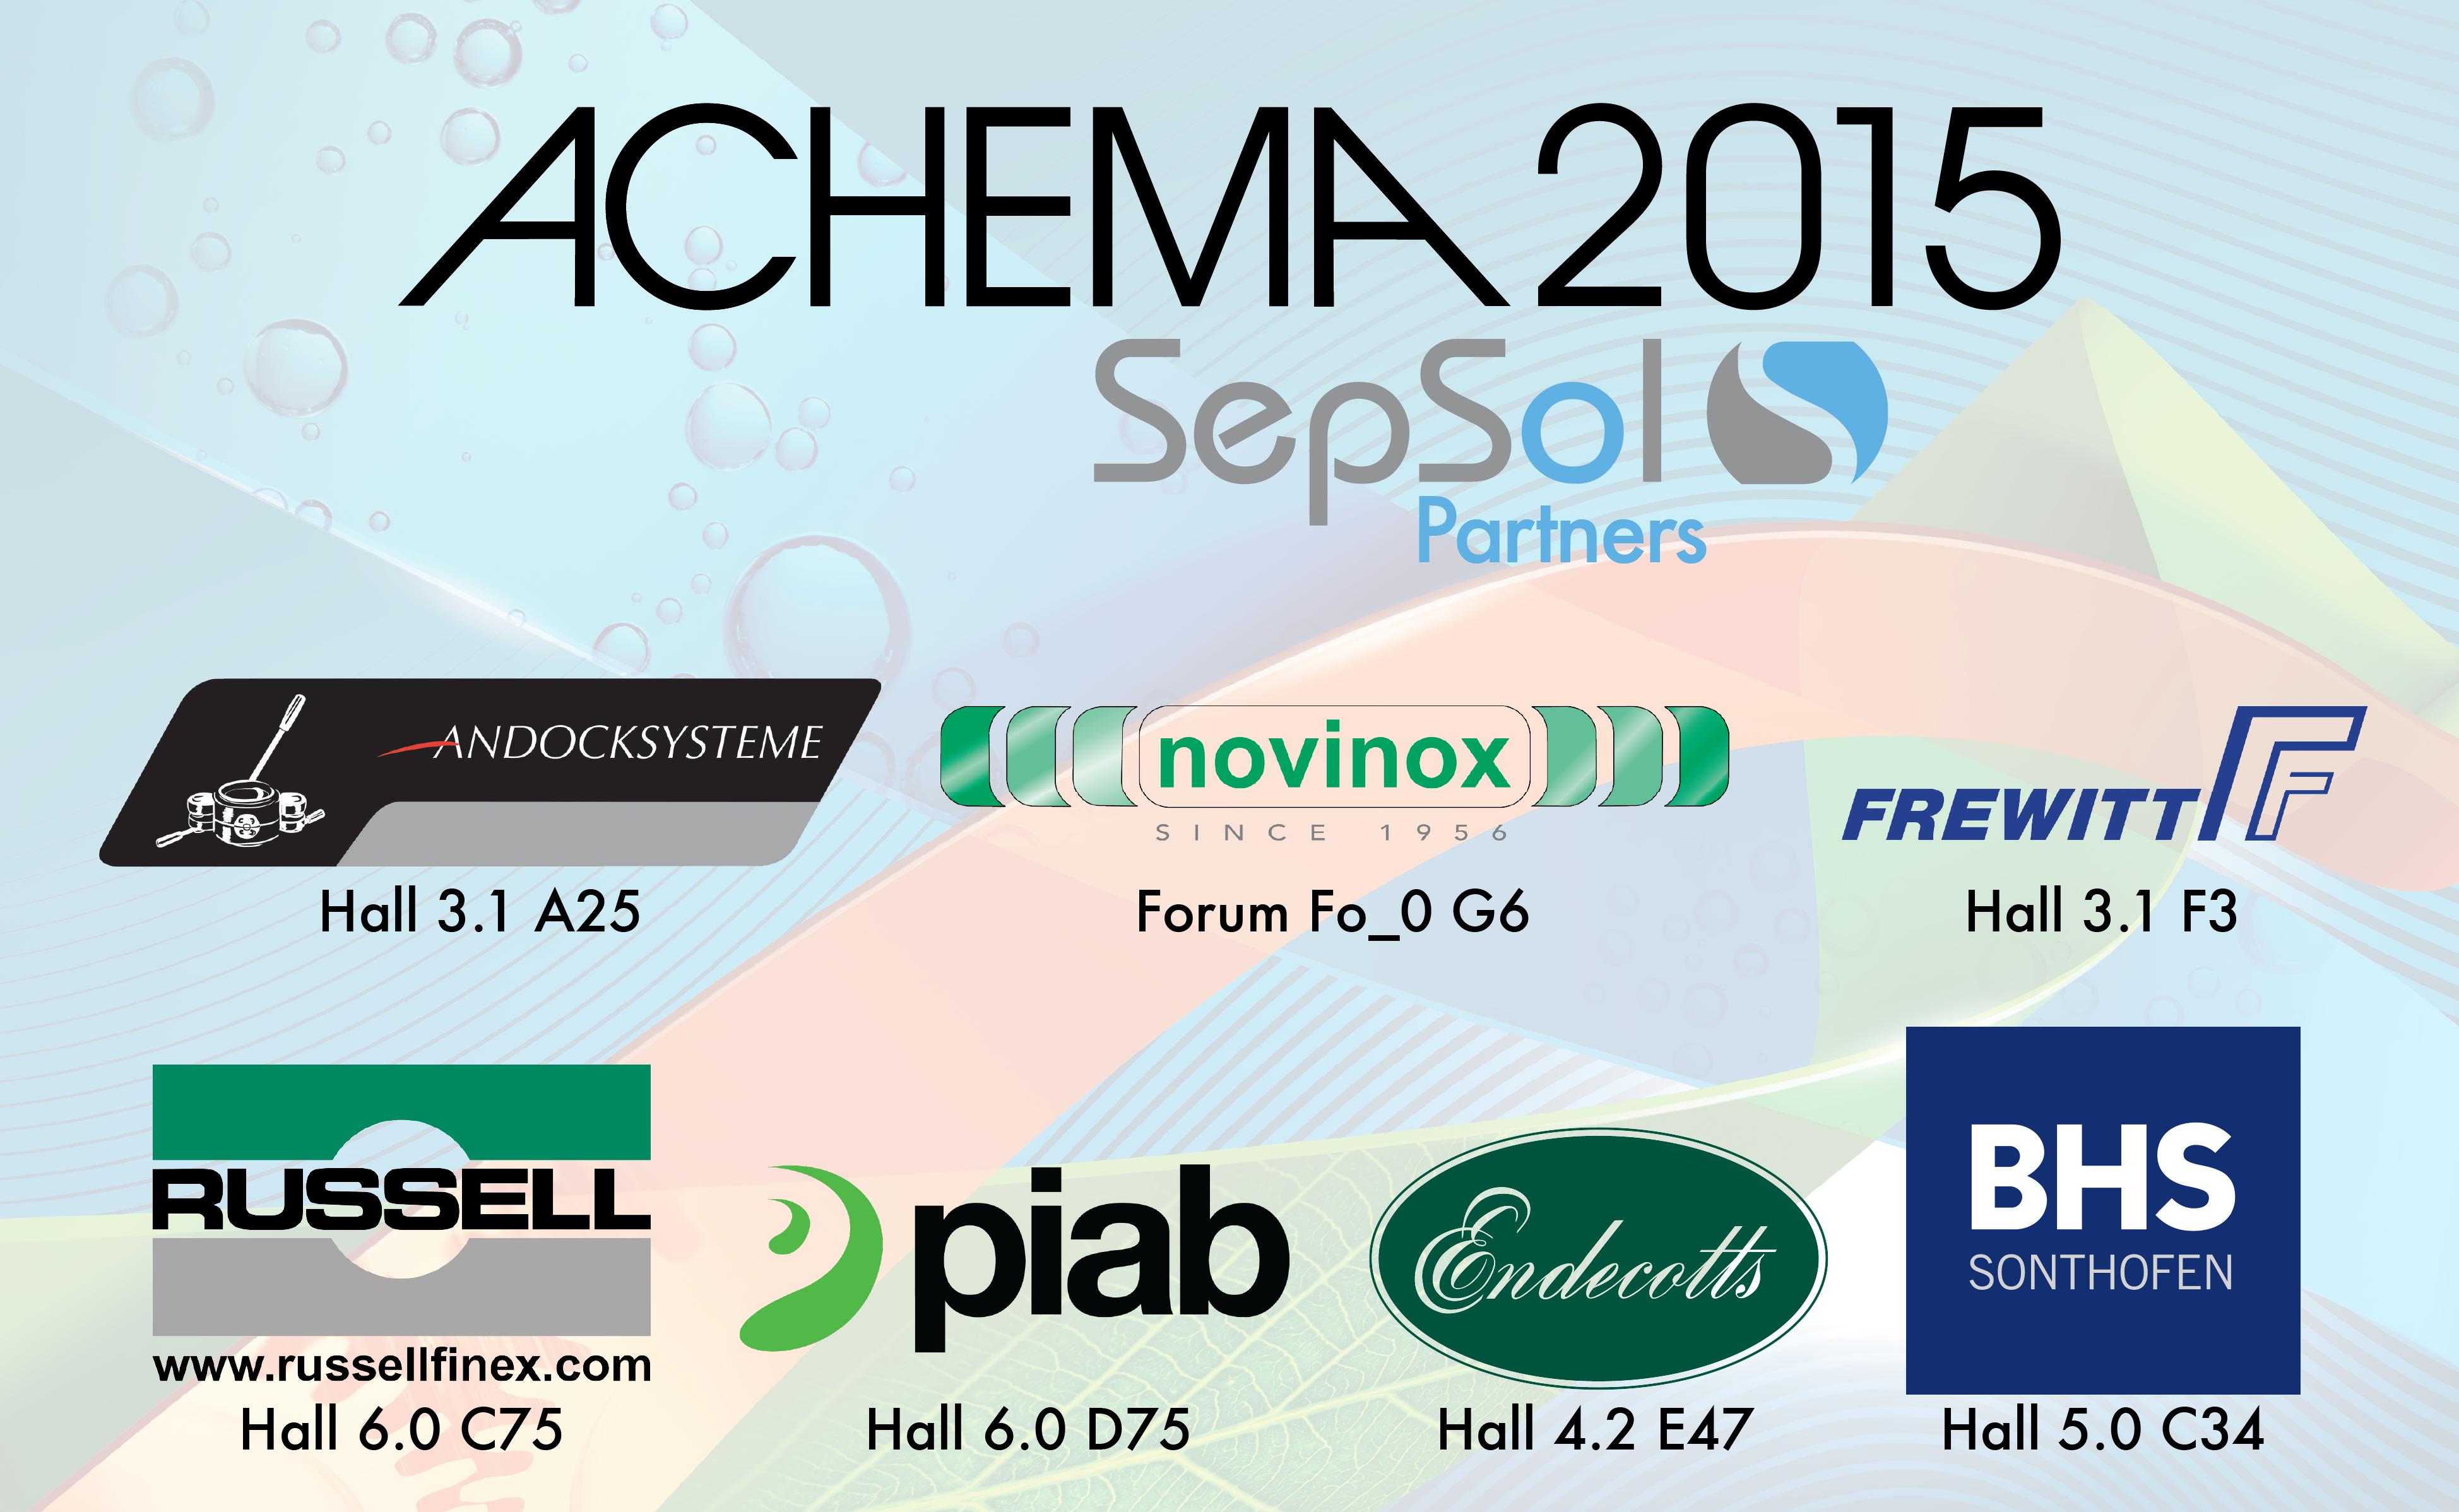 Achema 2015 SepSol Partners